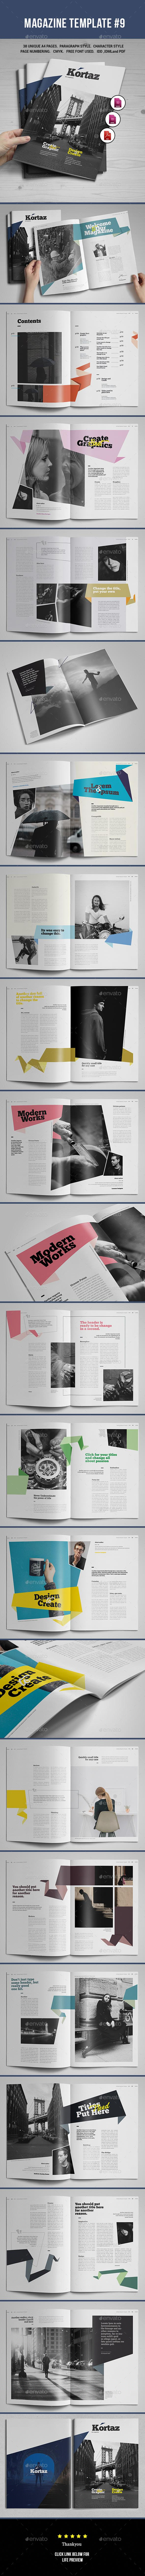 Magazine Template #9 - Magazines Print Templates